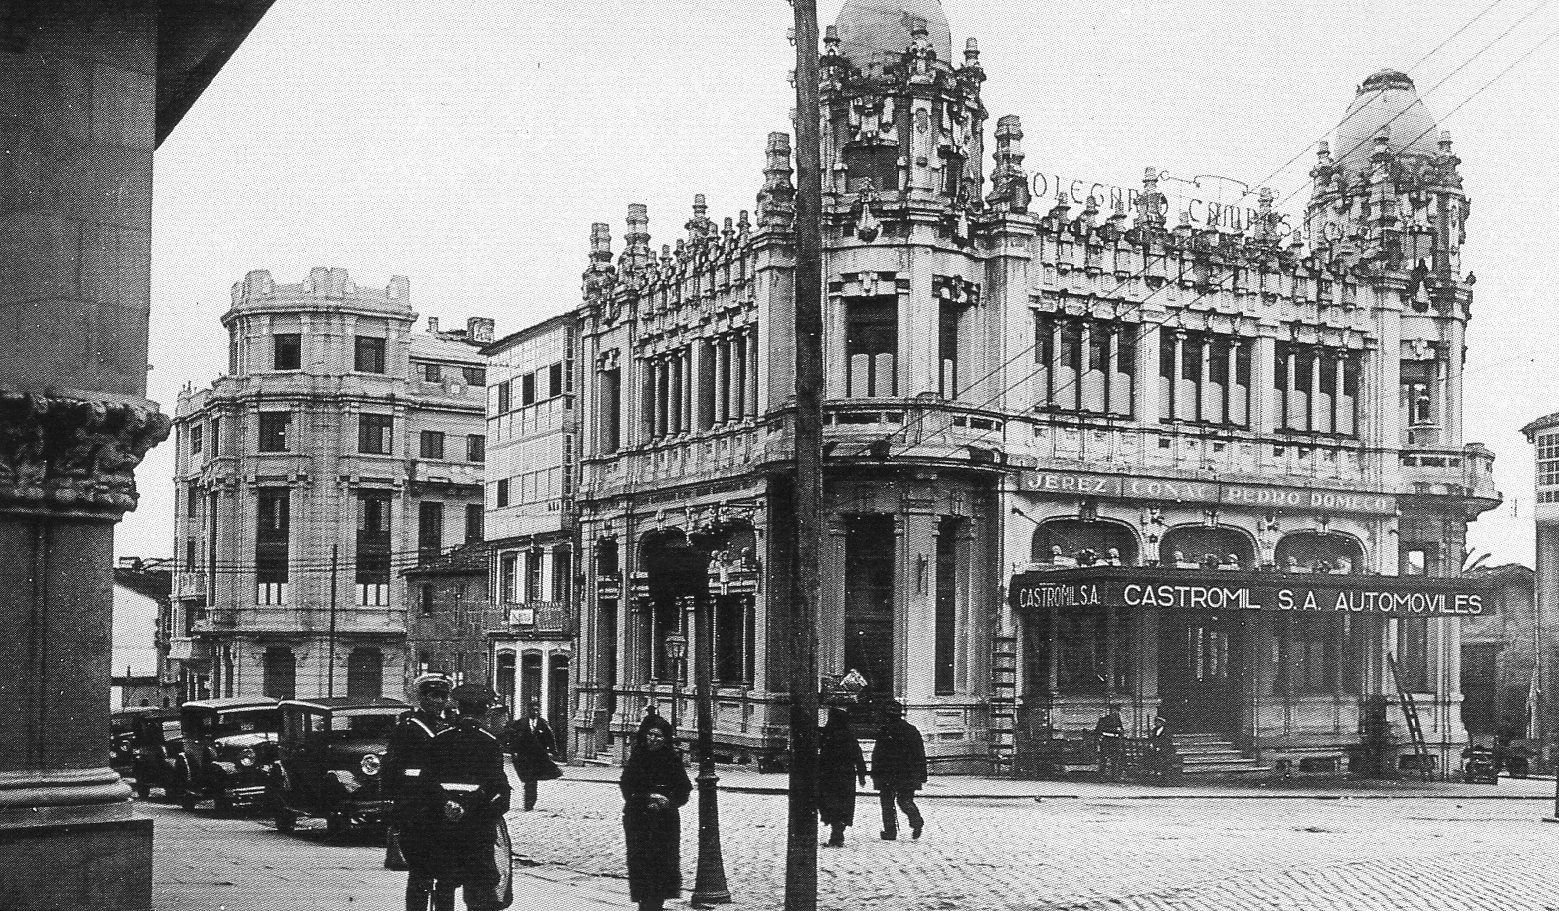 Plaza de Galicia, Santiago, around 1930